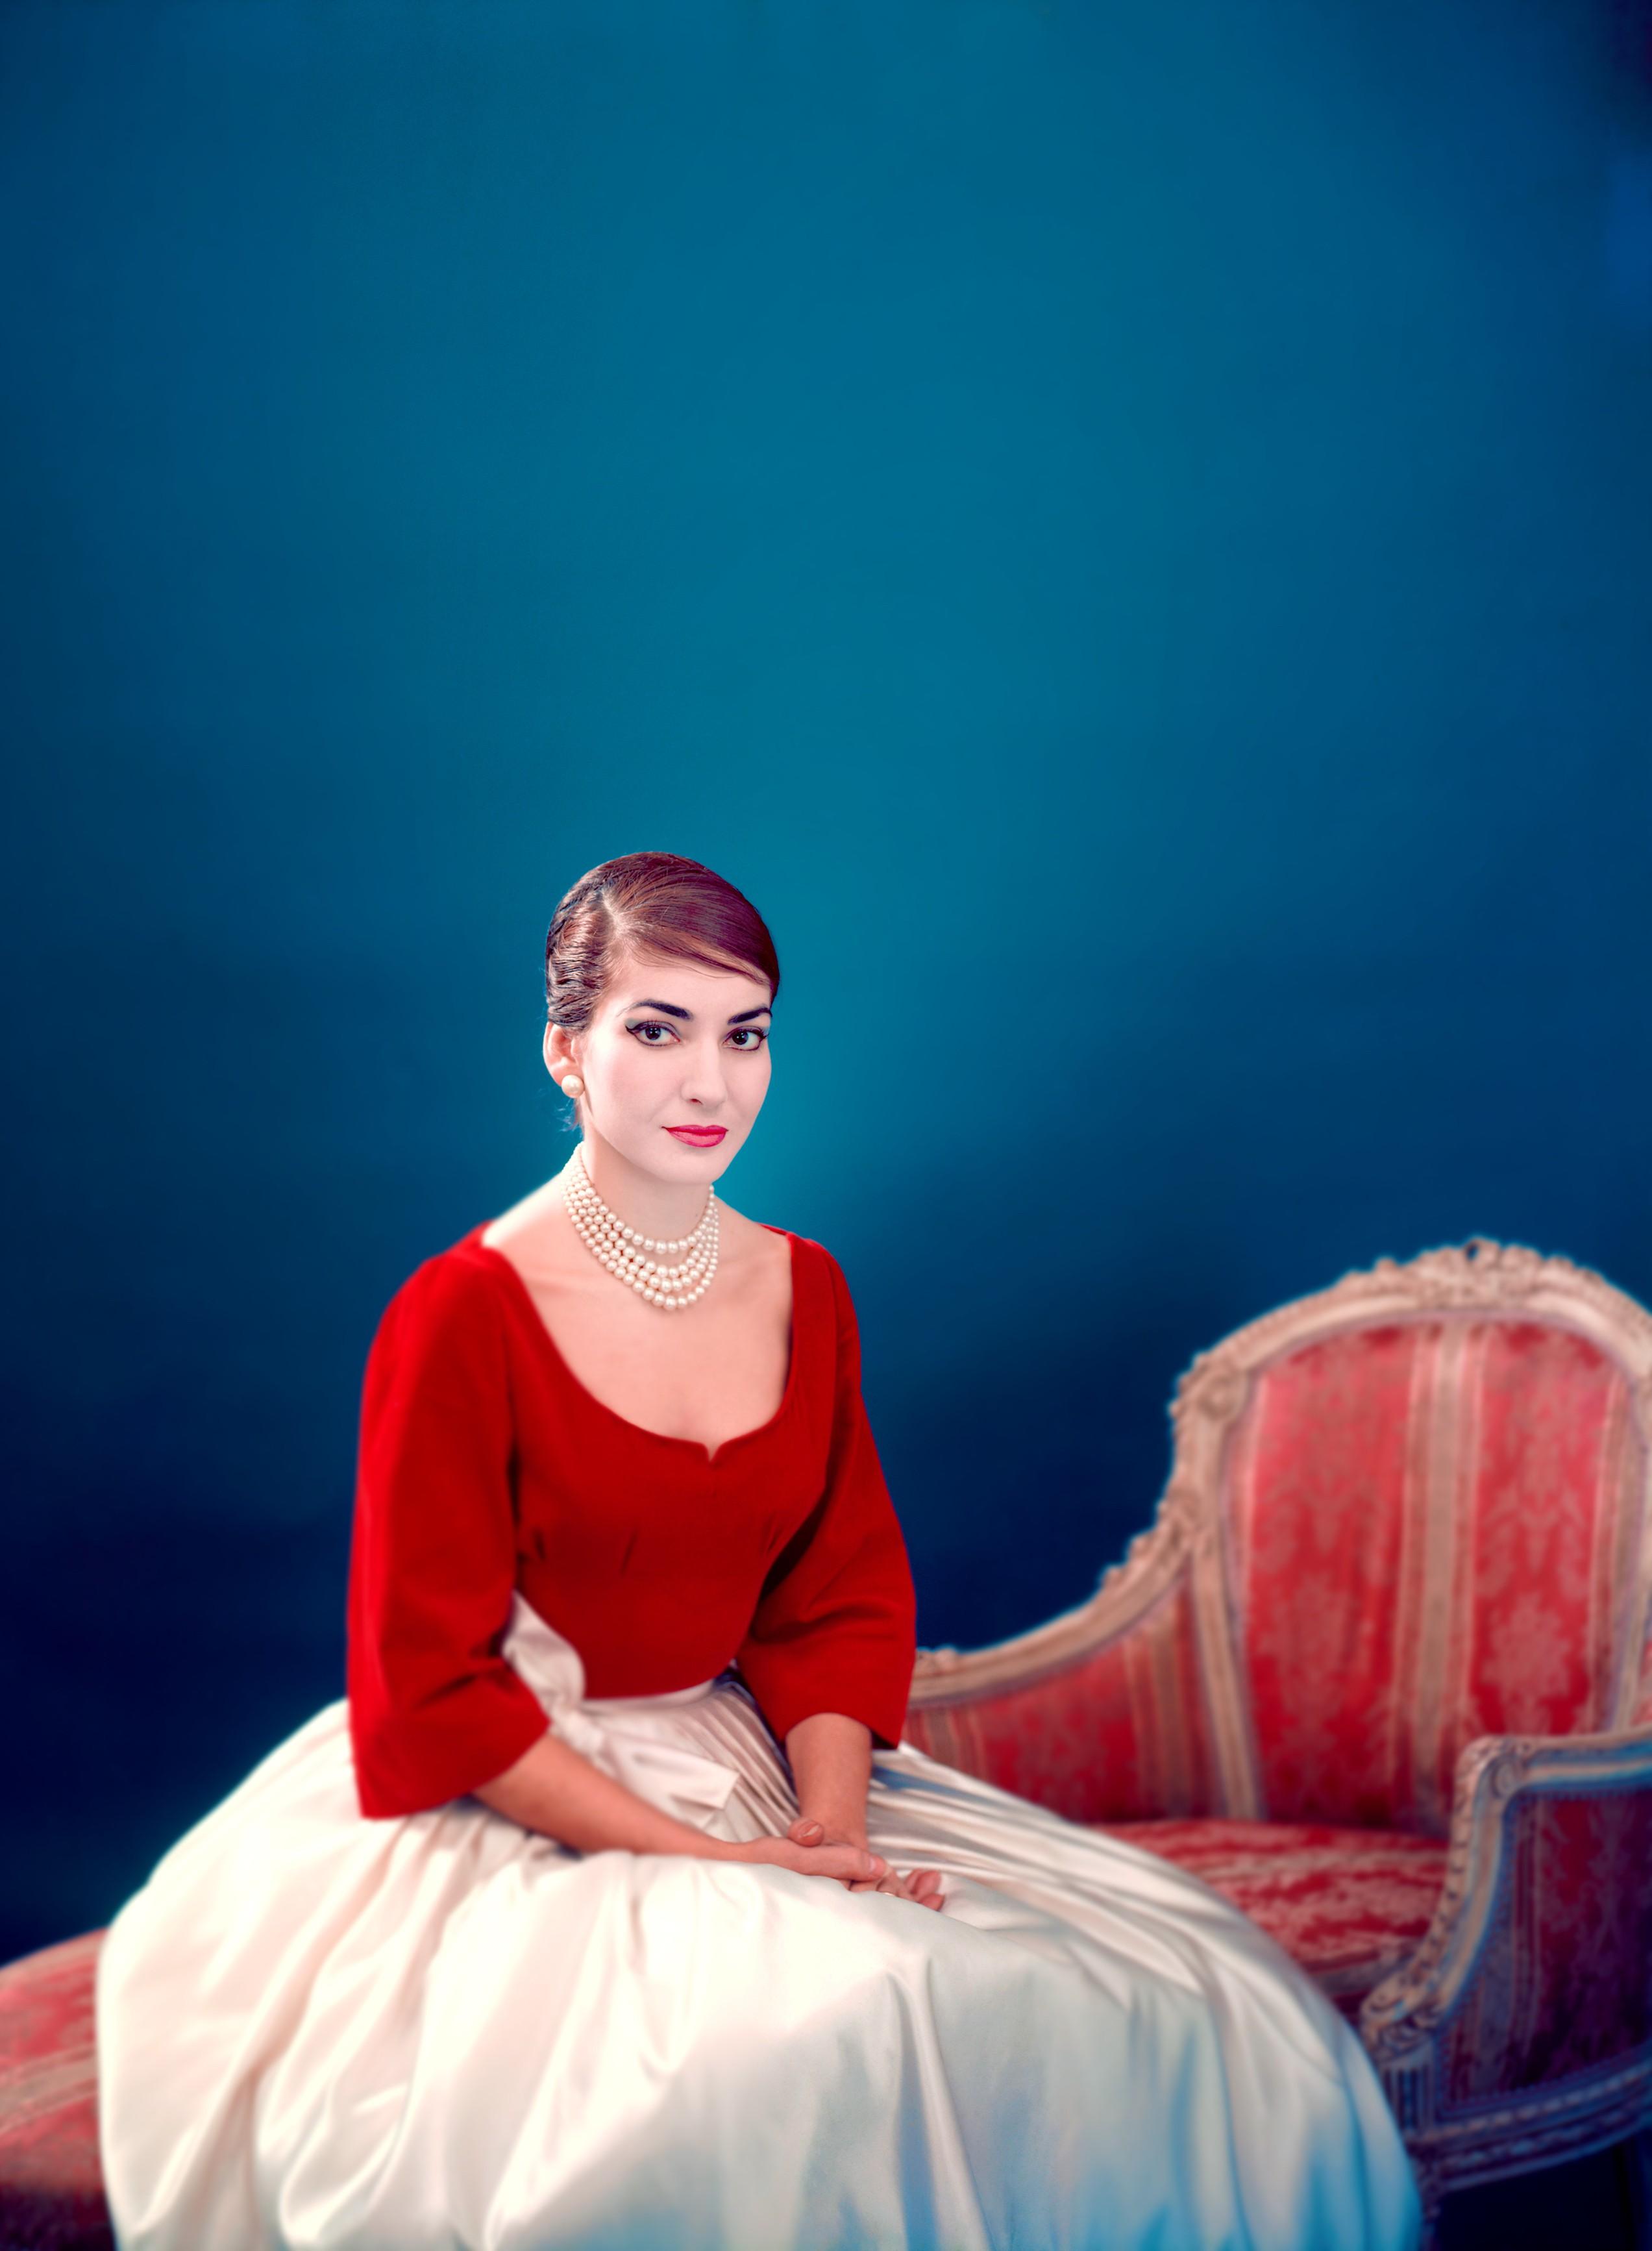 Maria Callas (Foto: Copyright Fonds de Dotation Maria Callas)